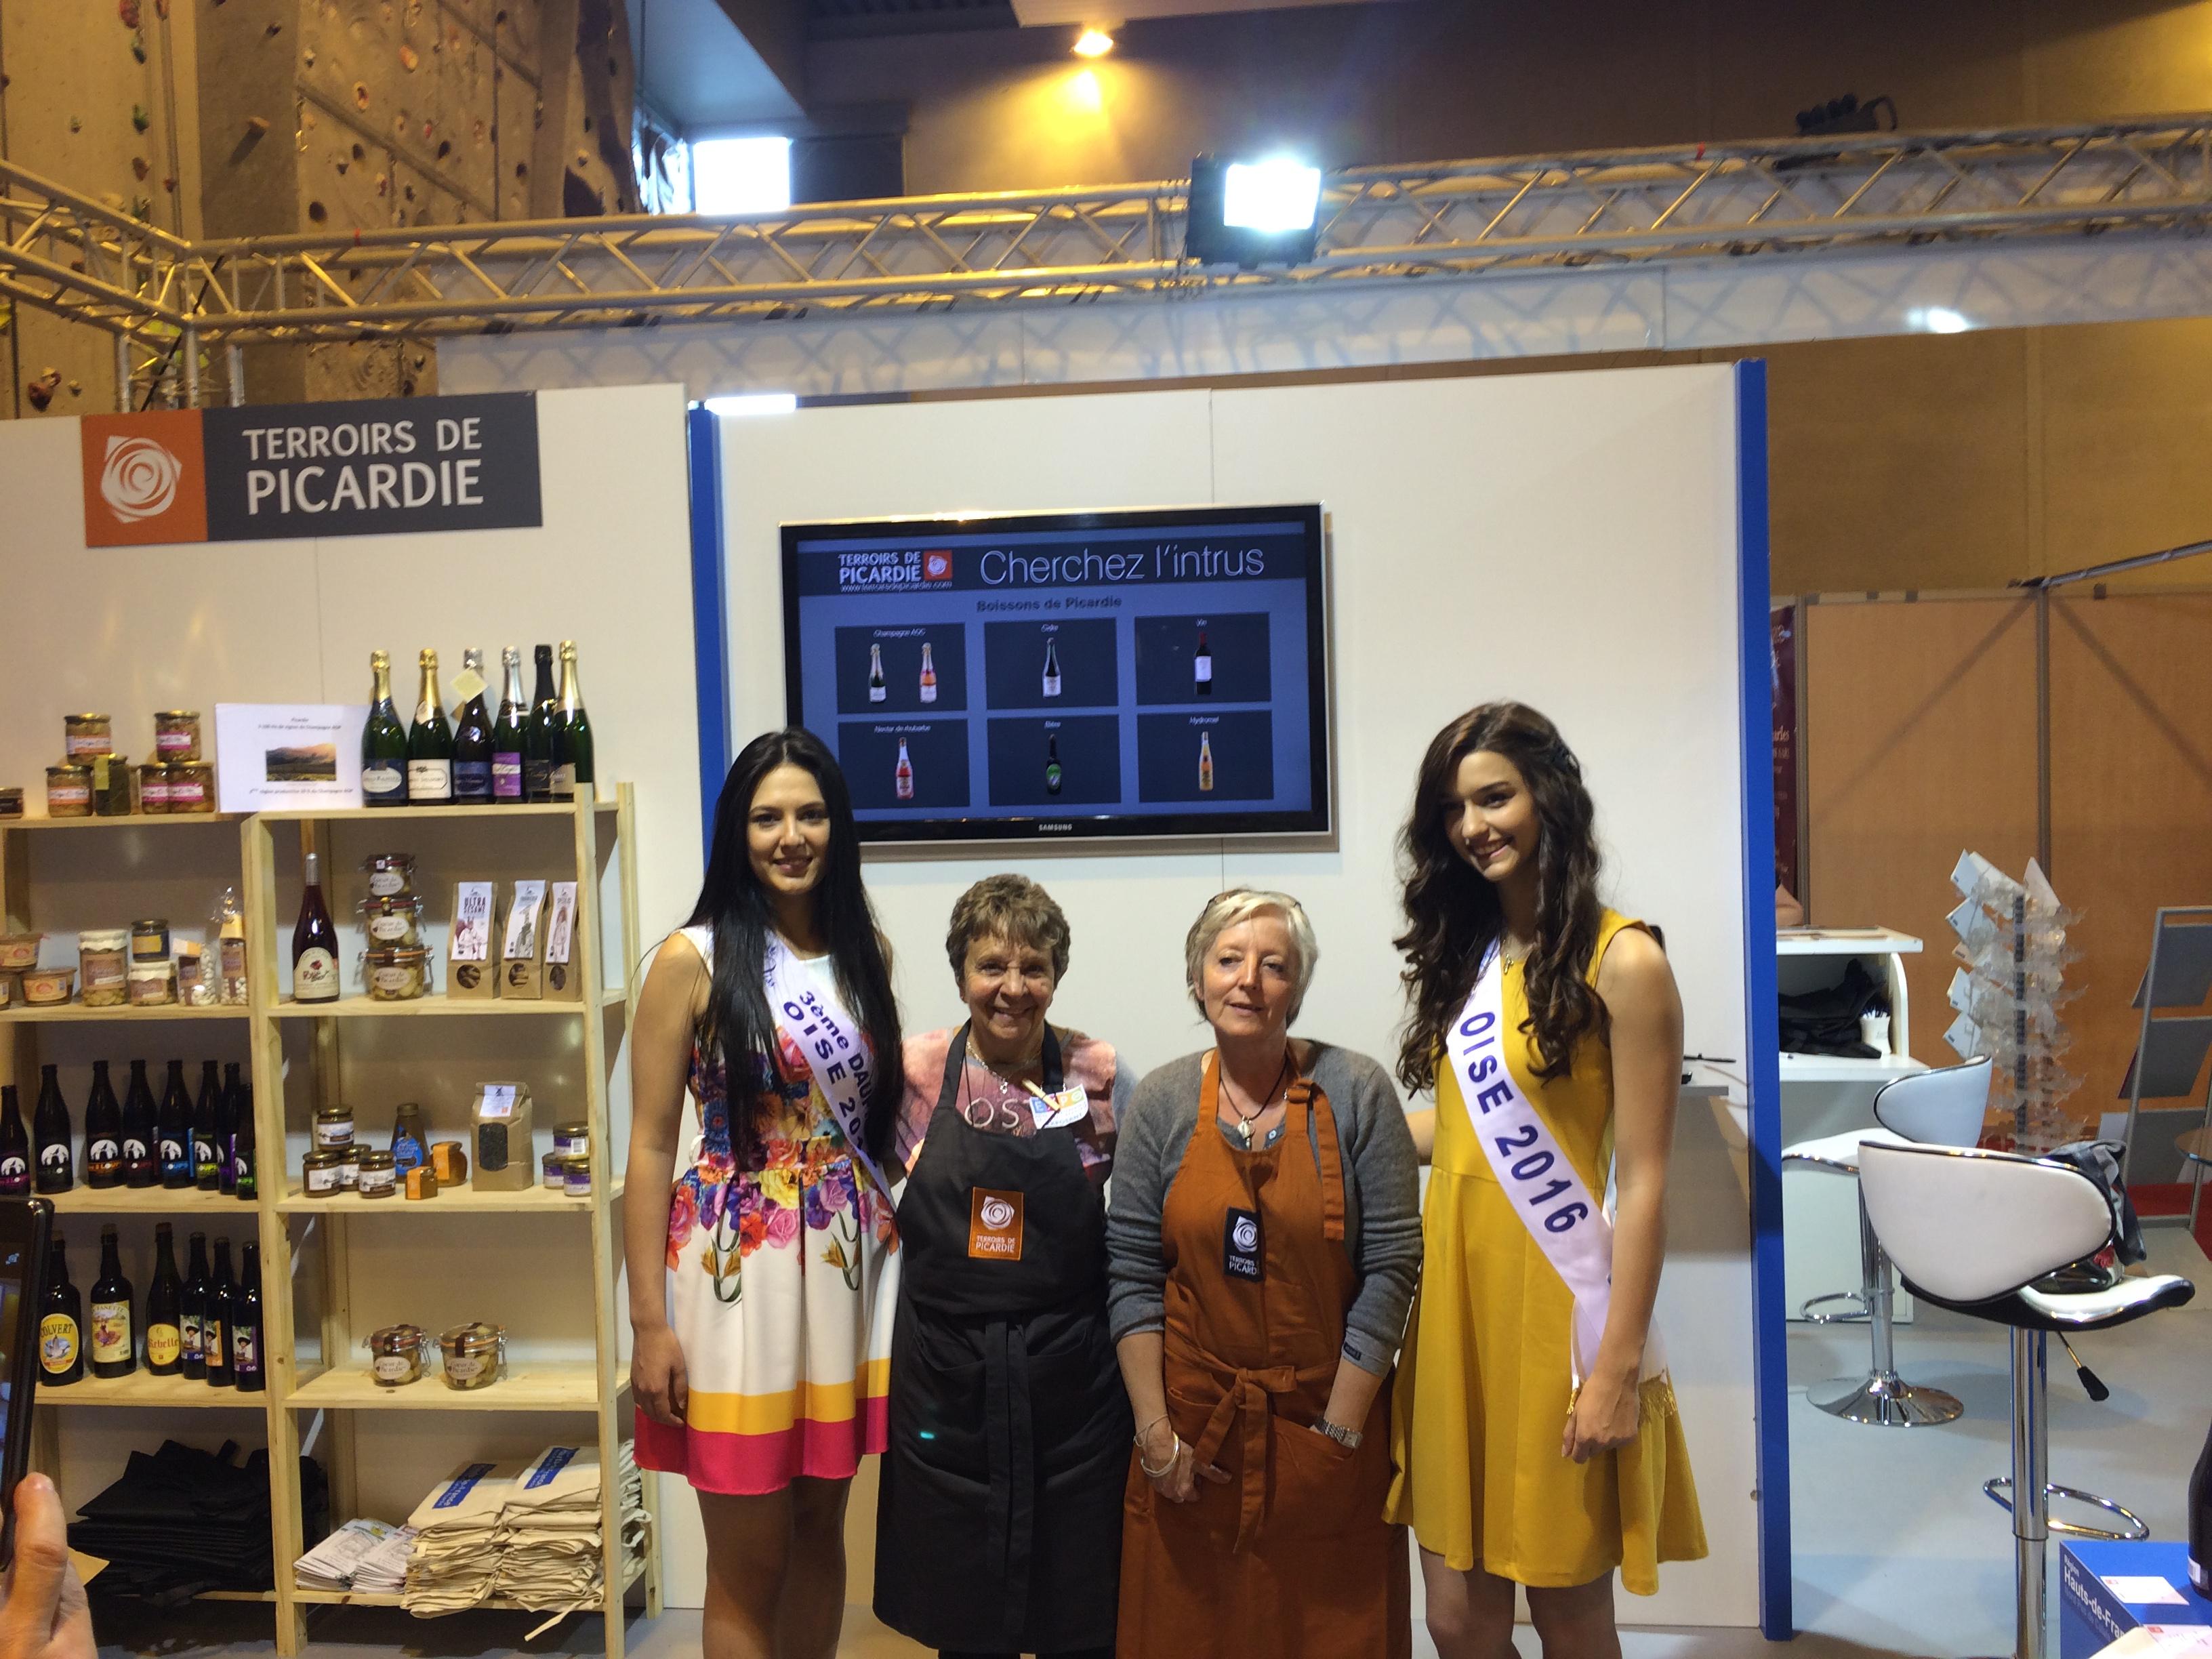 Photos comit miss oise picardie expo 60 foire for Amiens foire expo